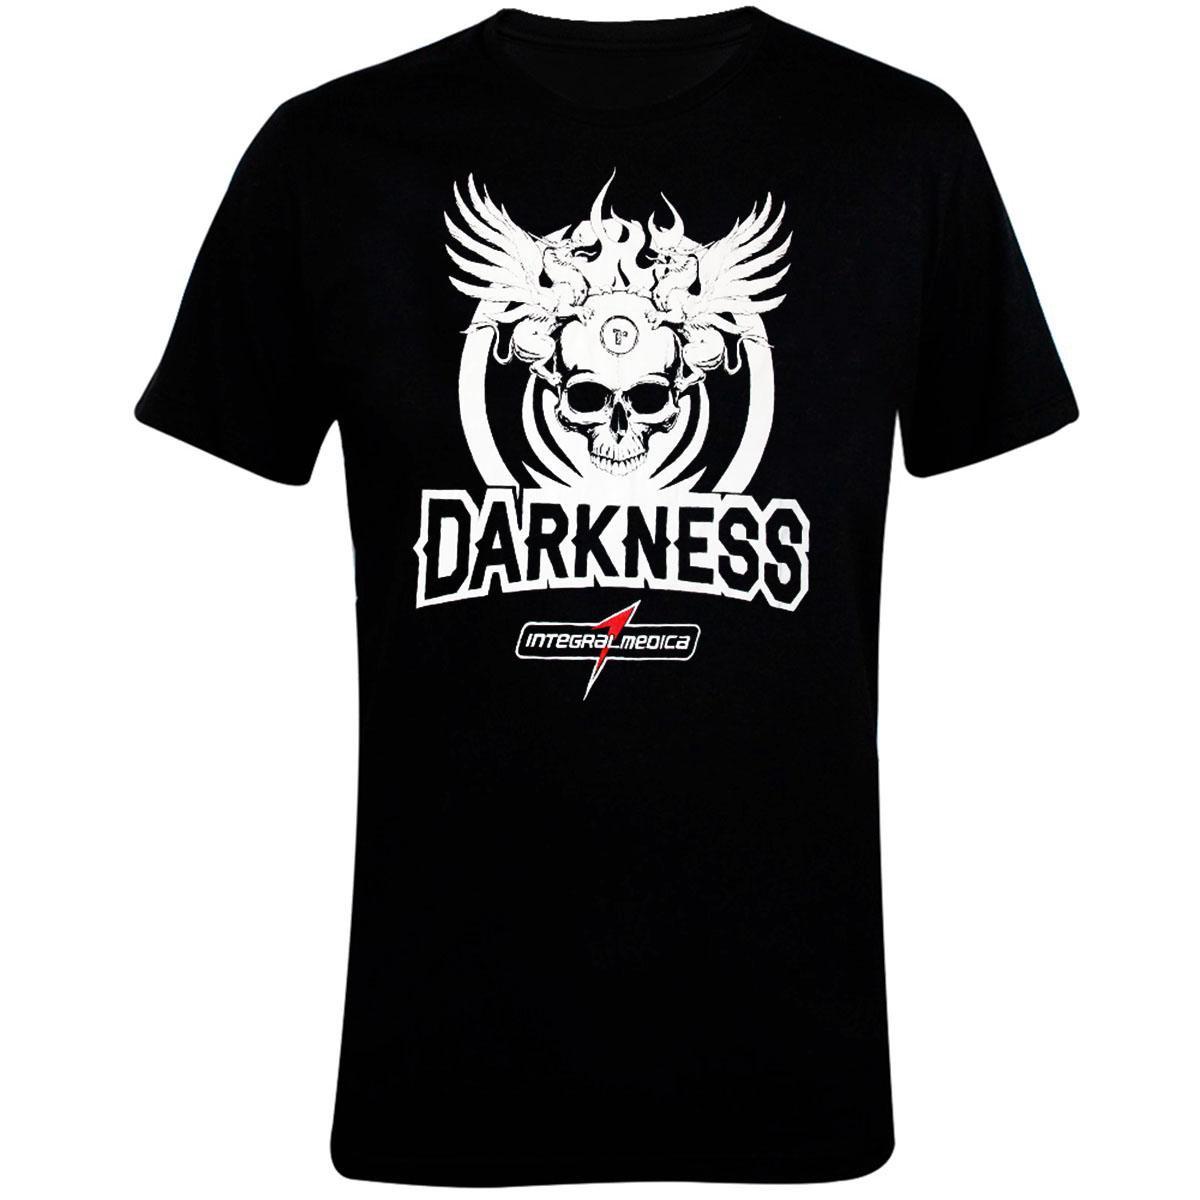 822acb8436 Camiseta Darkness Integralmedica - Compre Agora